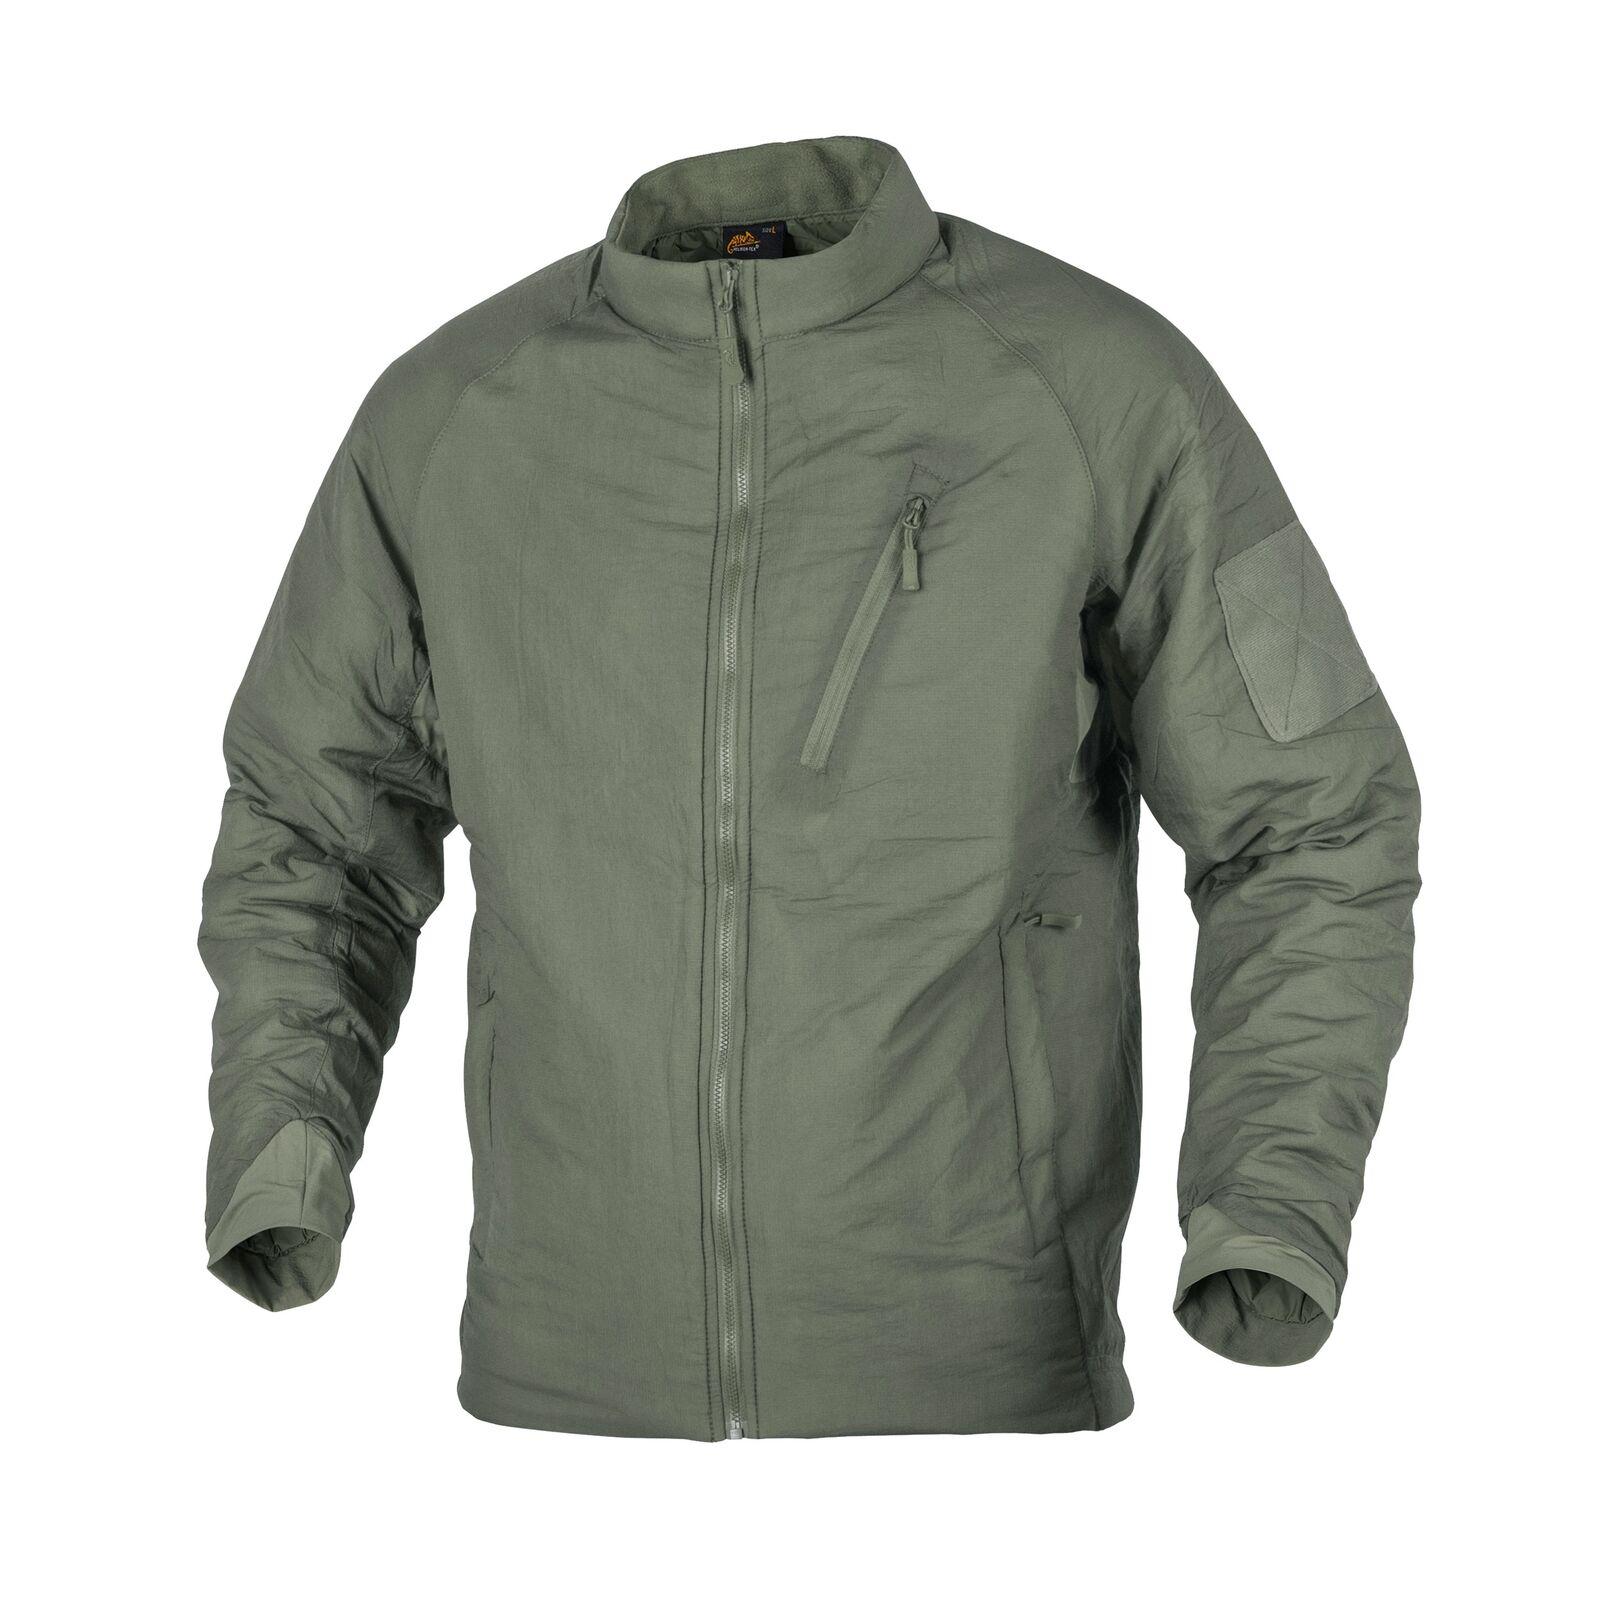 HELIKON-Tex wolfhound leves muy años chaqueta-climashield apex 67g-alfa verde